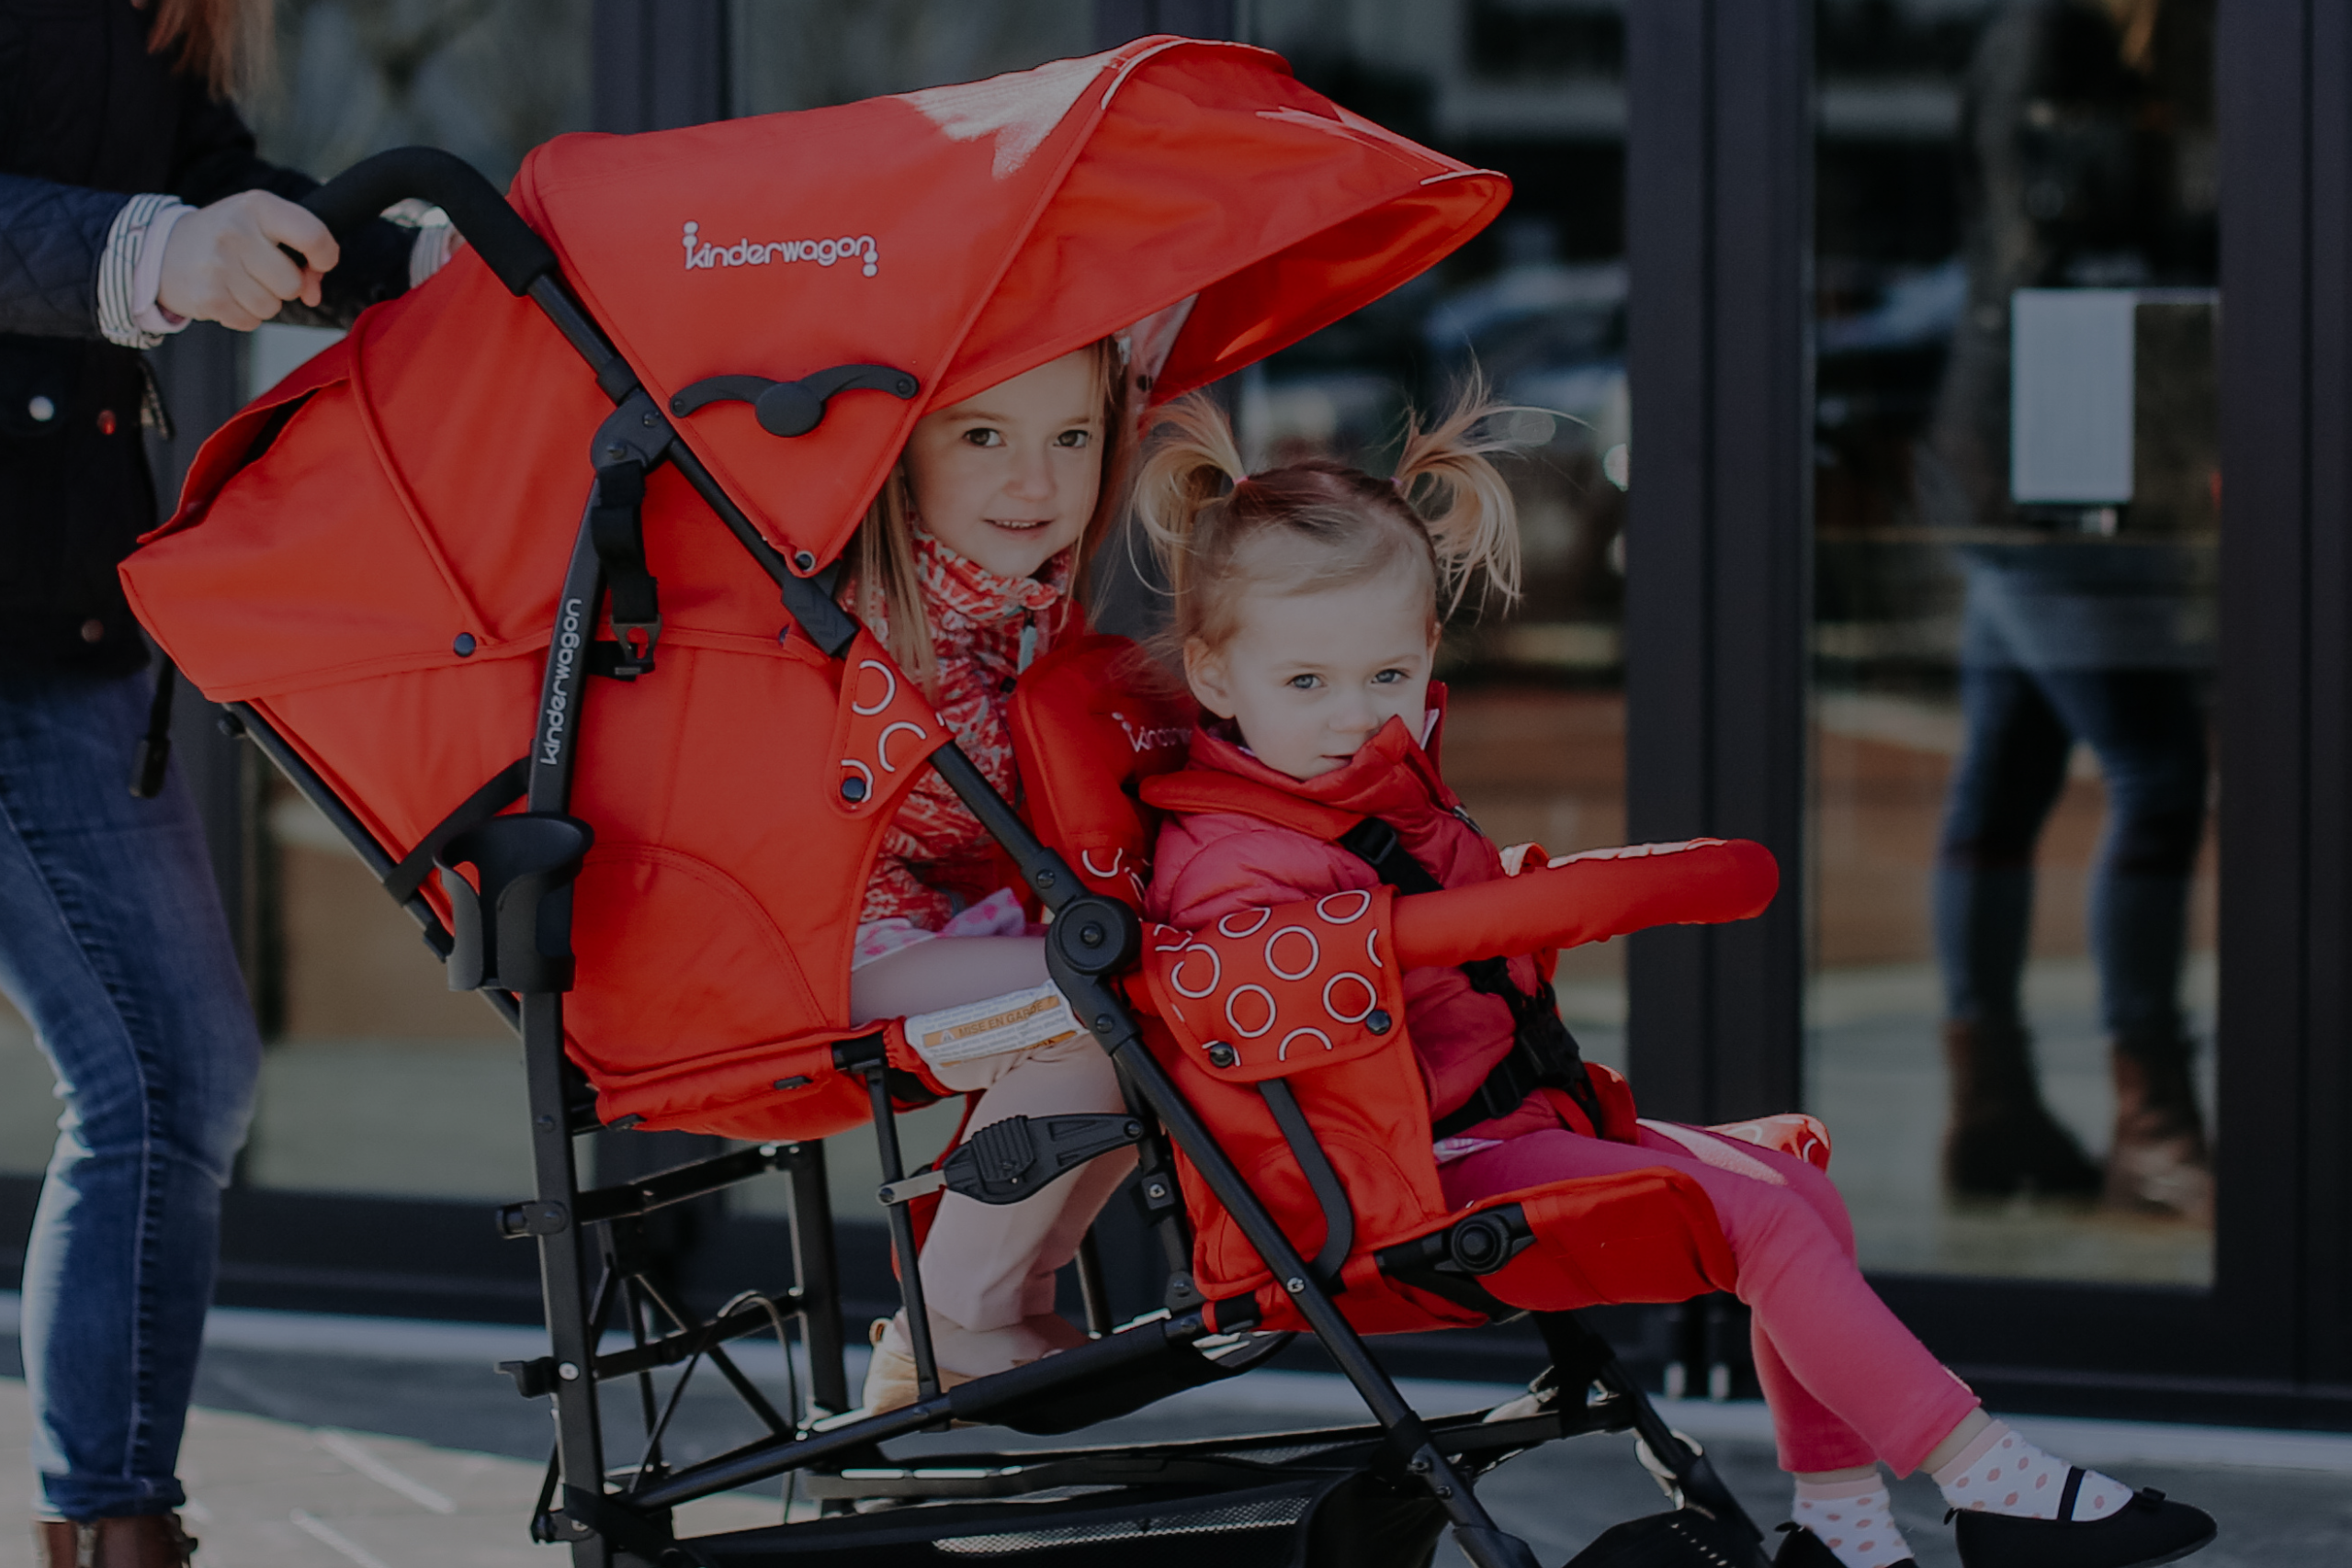 best double tandum stroller for two kids